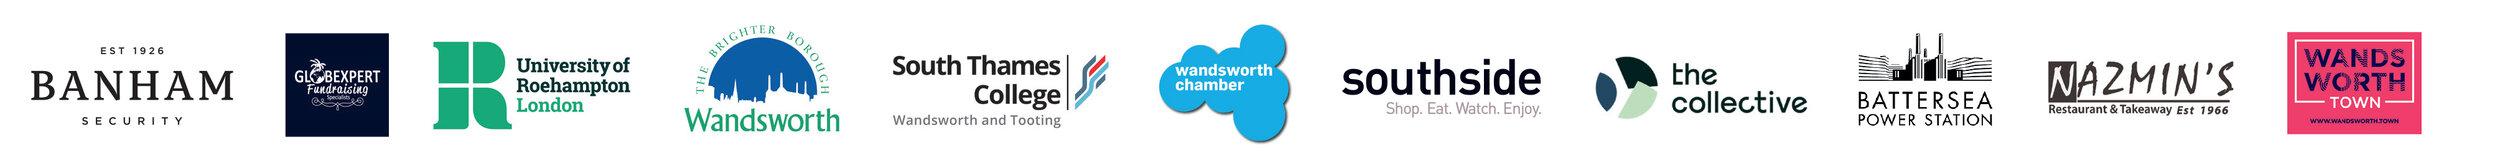 Wandsworth Awards Sponsors Email Footer.jpg